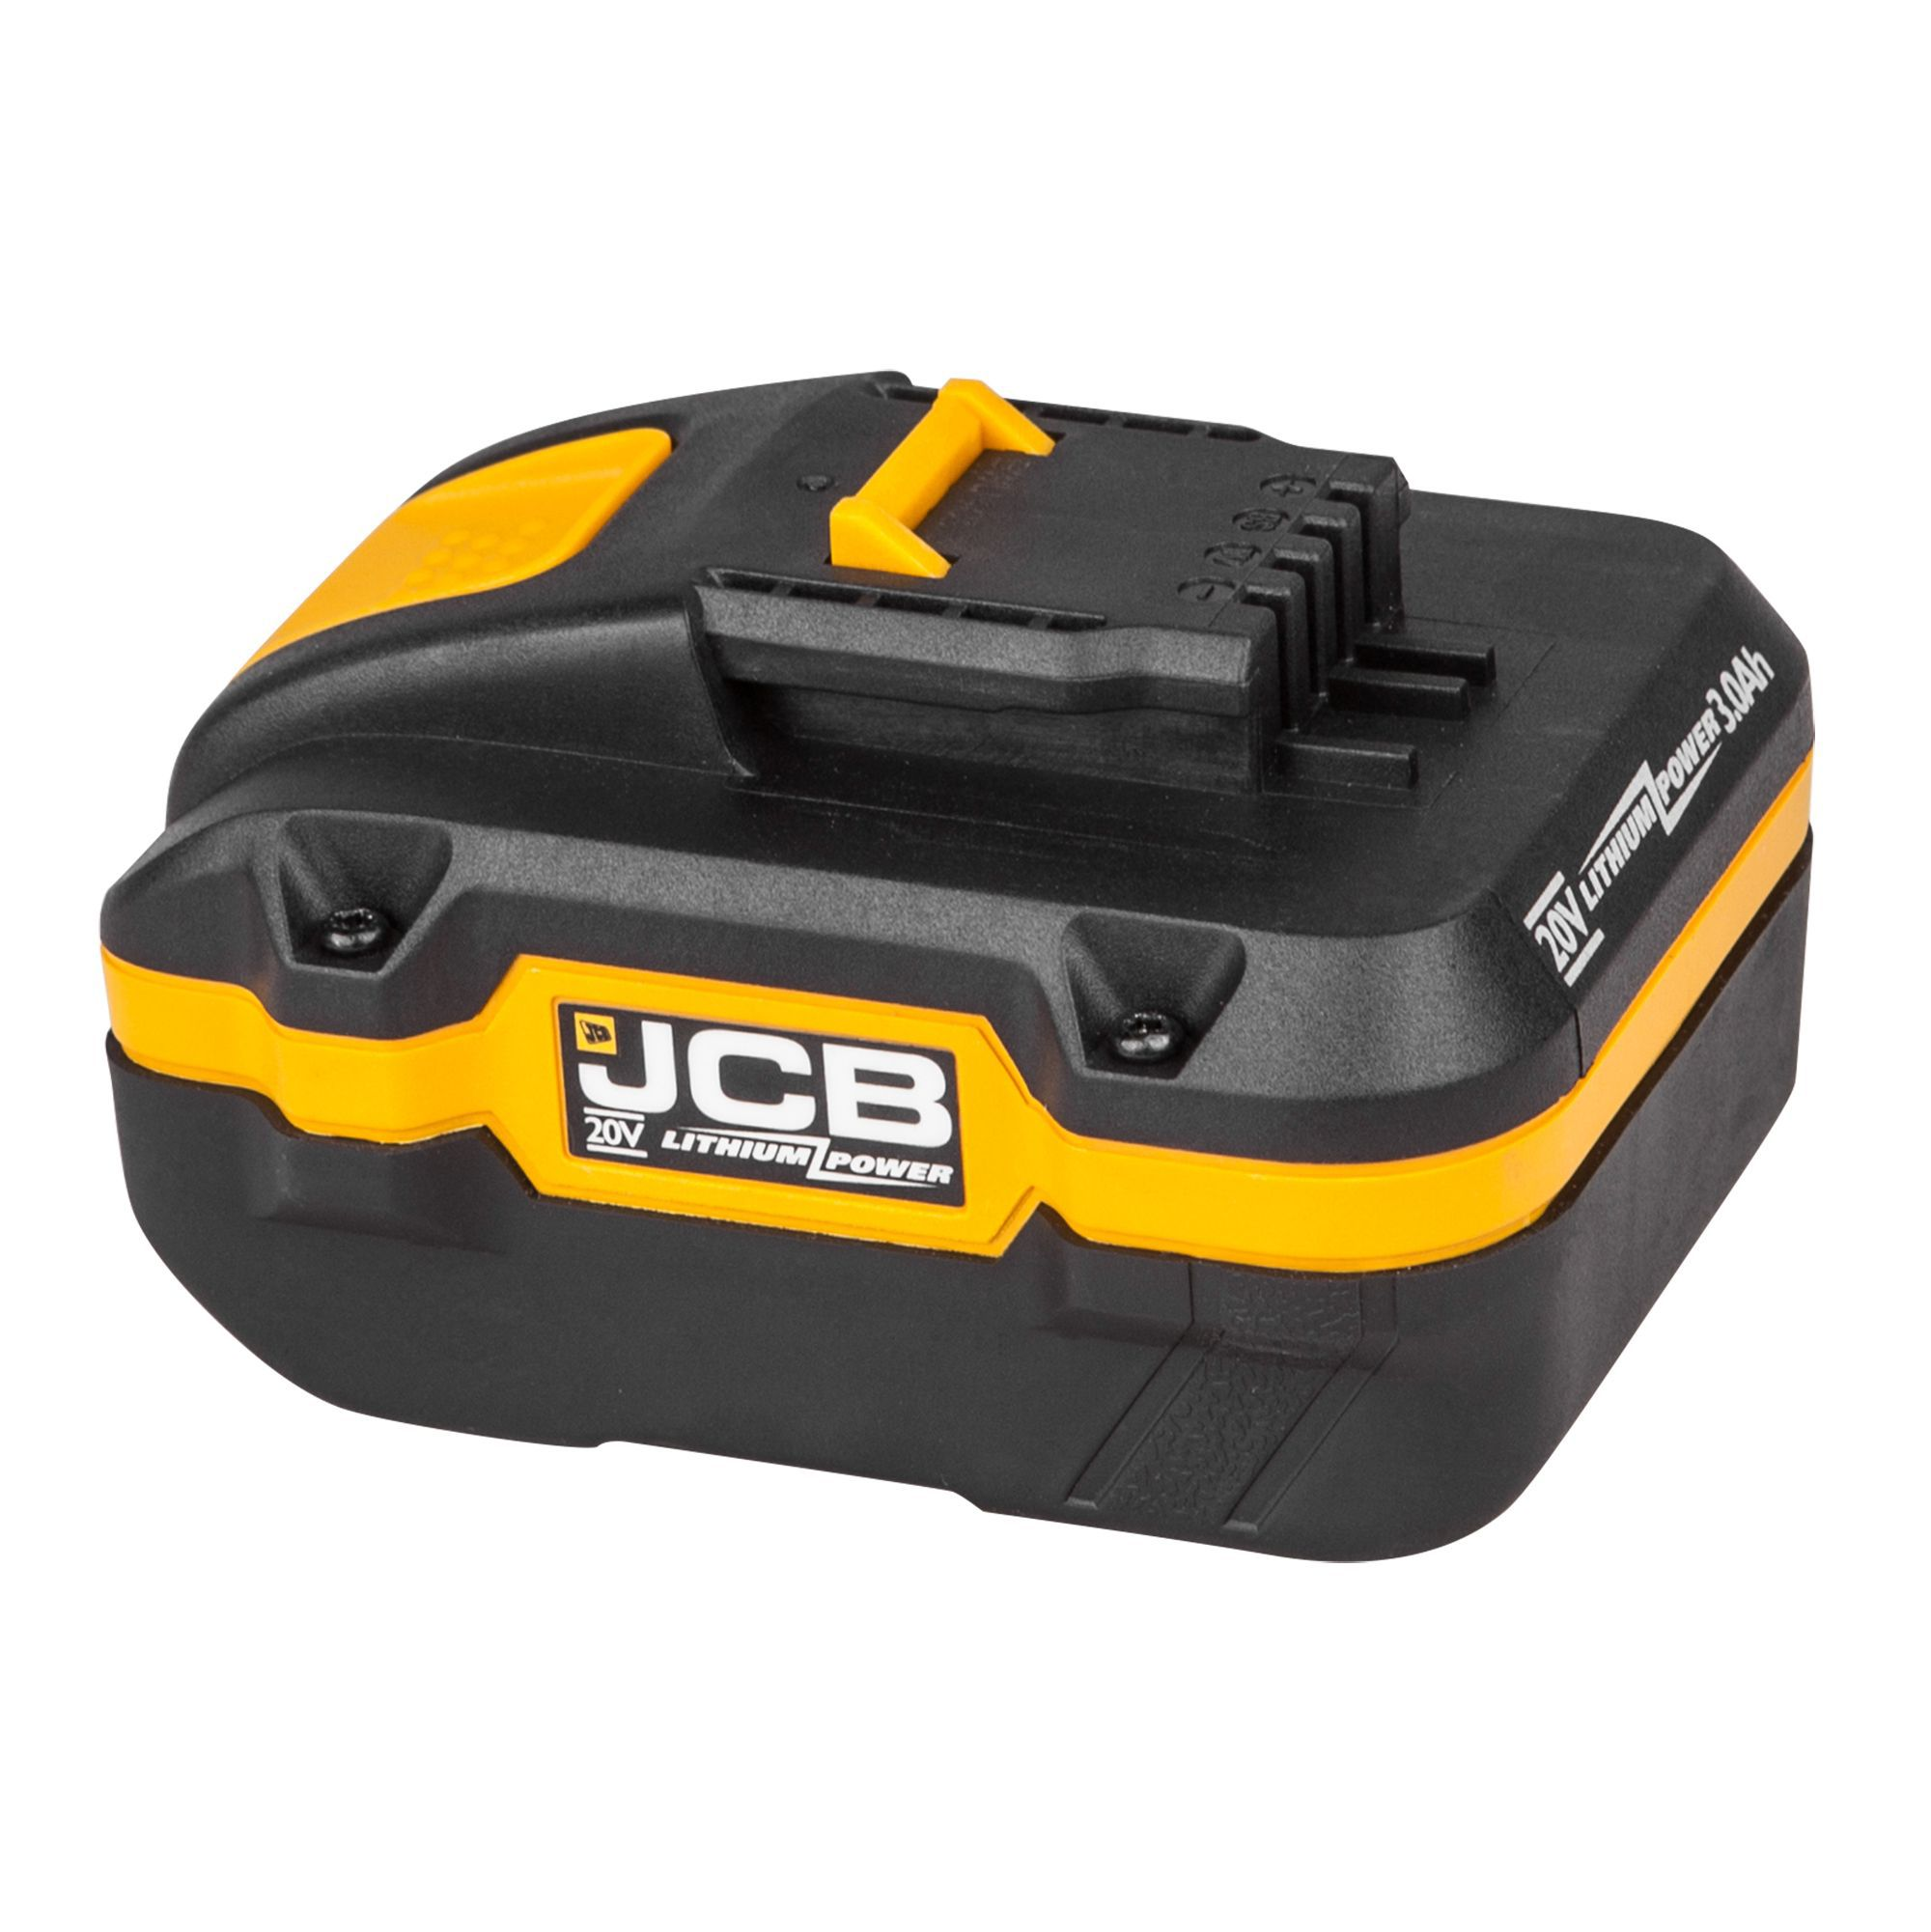 Jcb 20v Li Ion 3ah Battery Departments Tradepoint